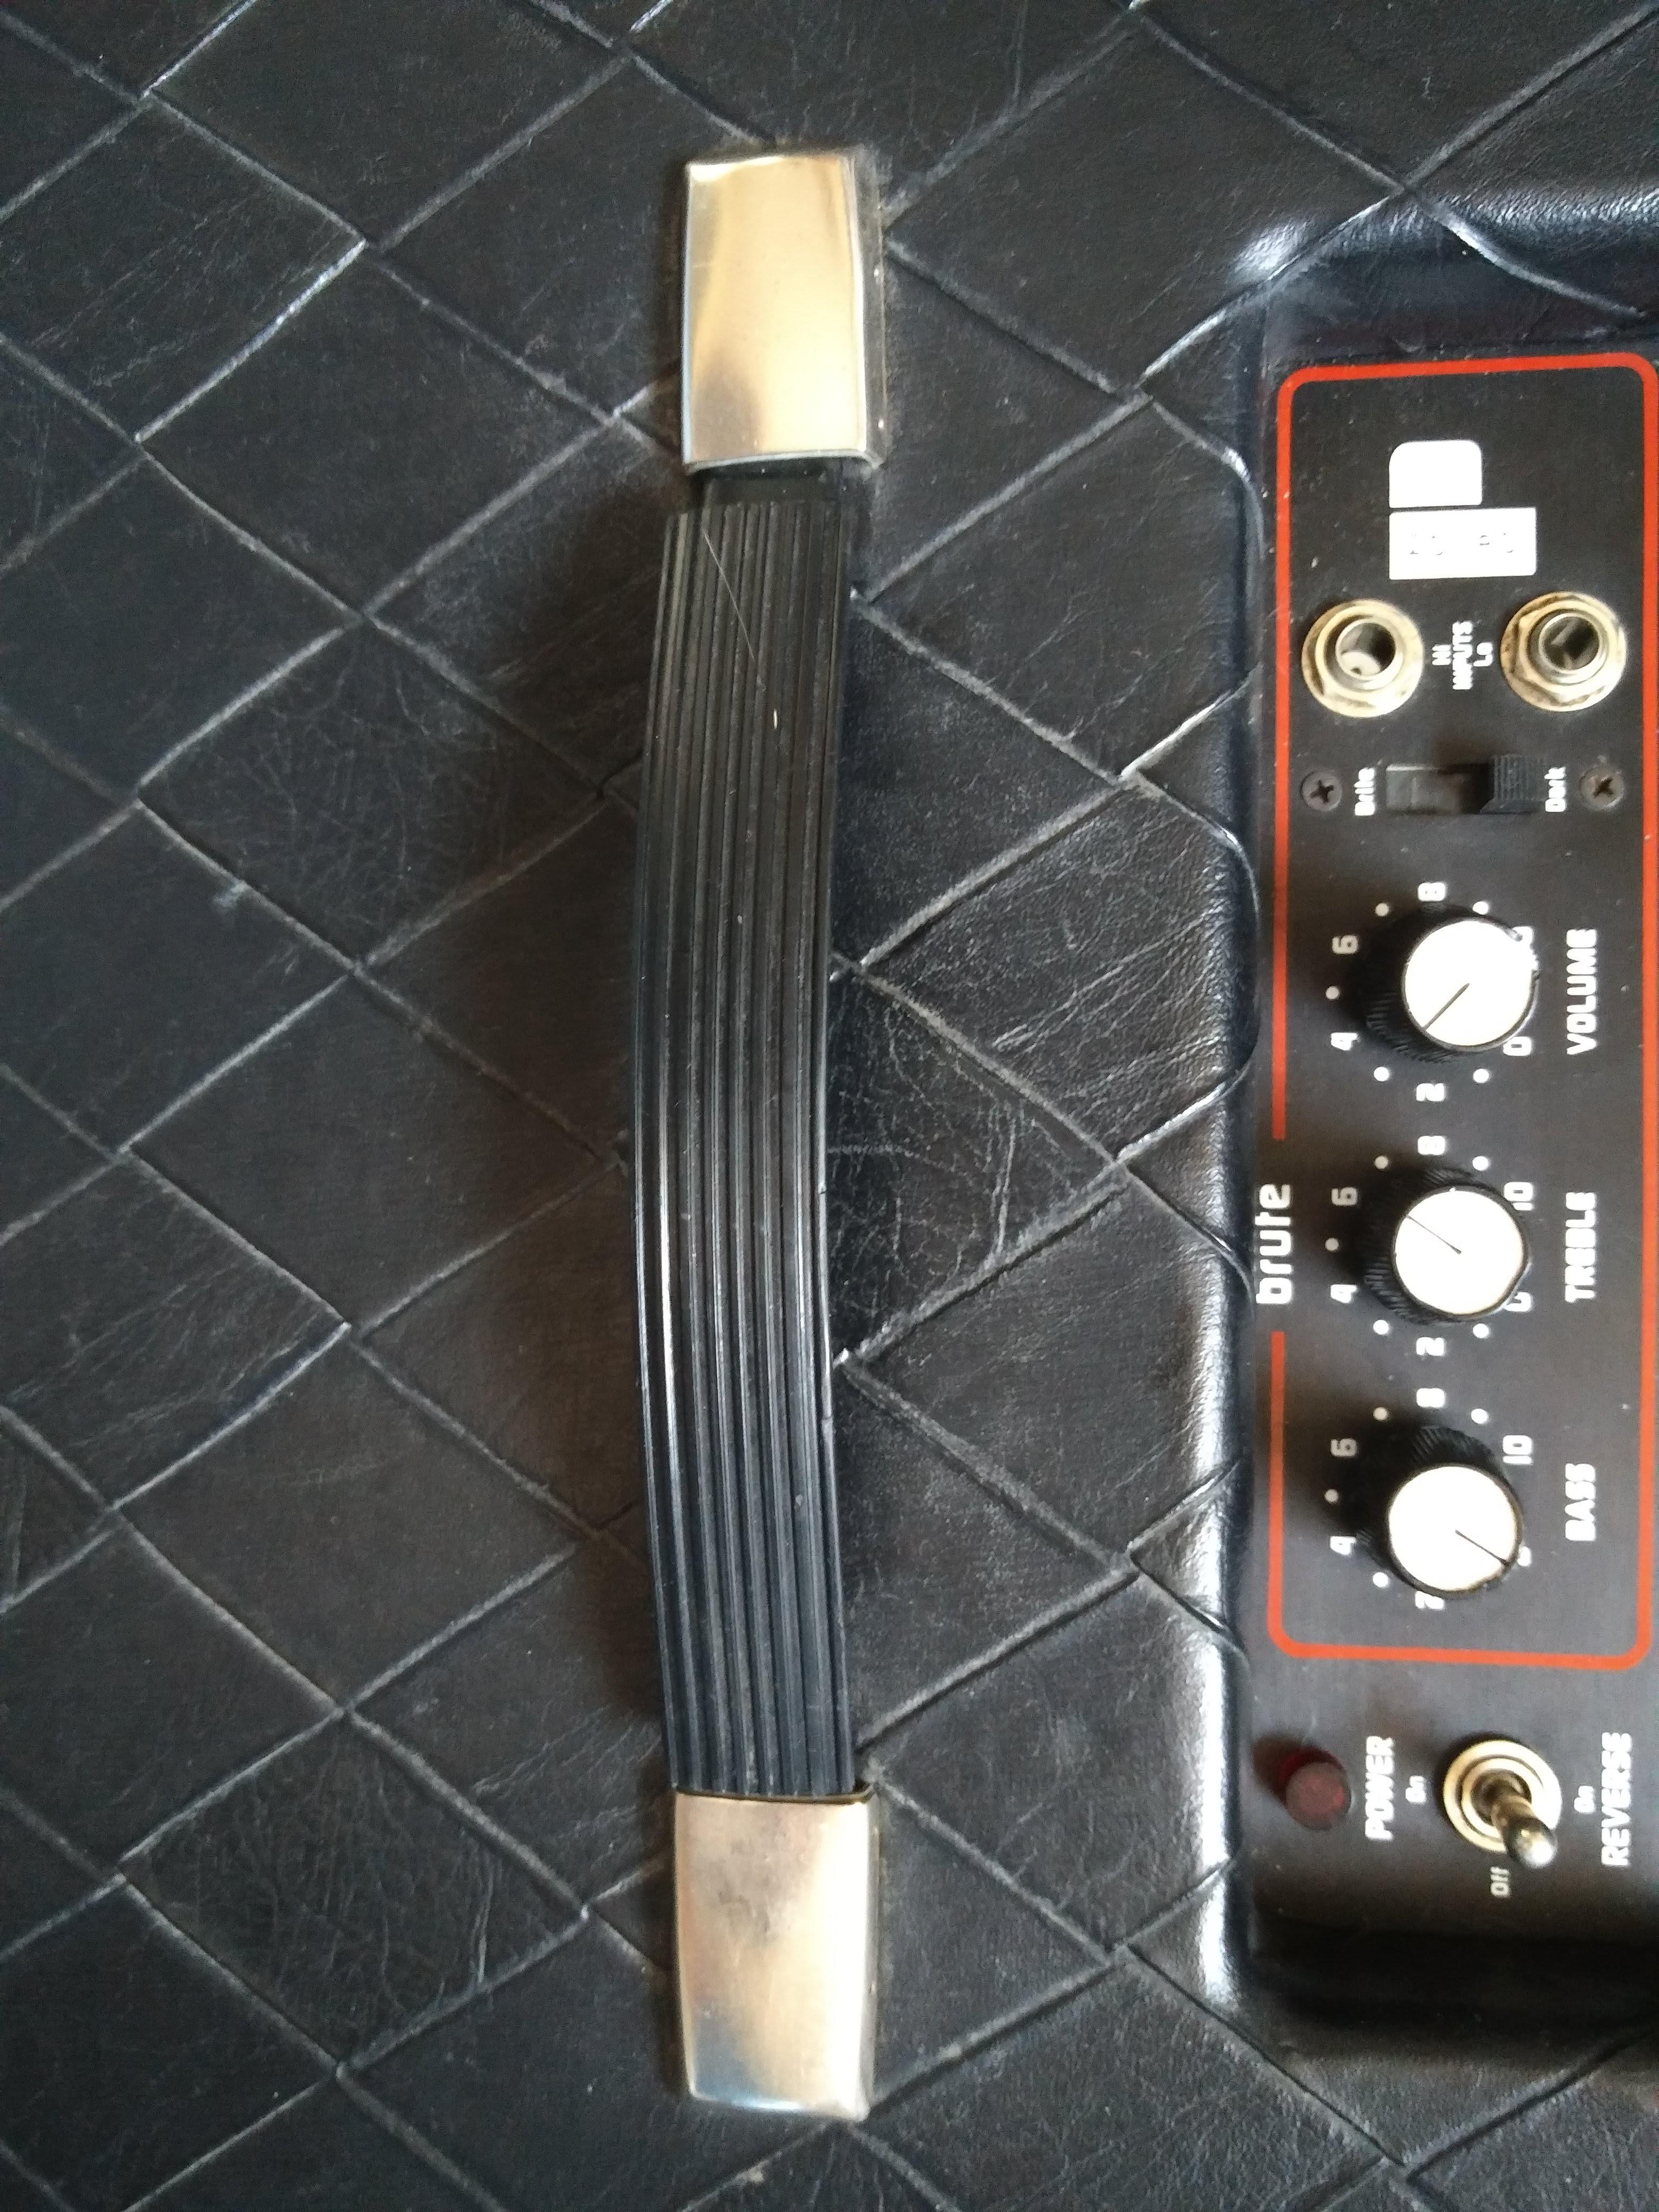 Polytone Minibrute repair